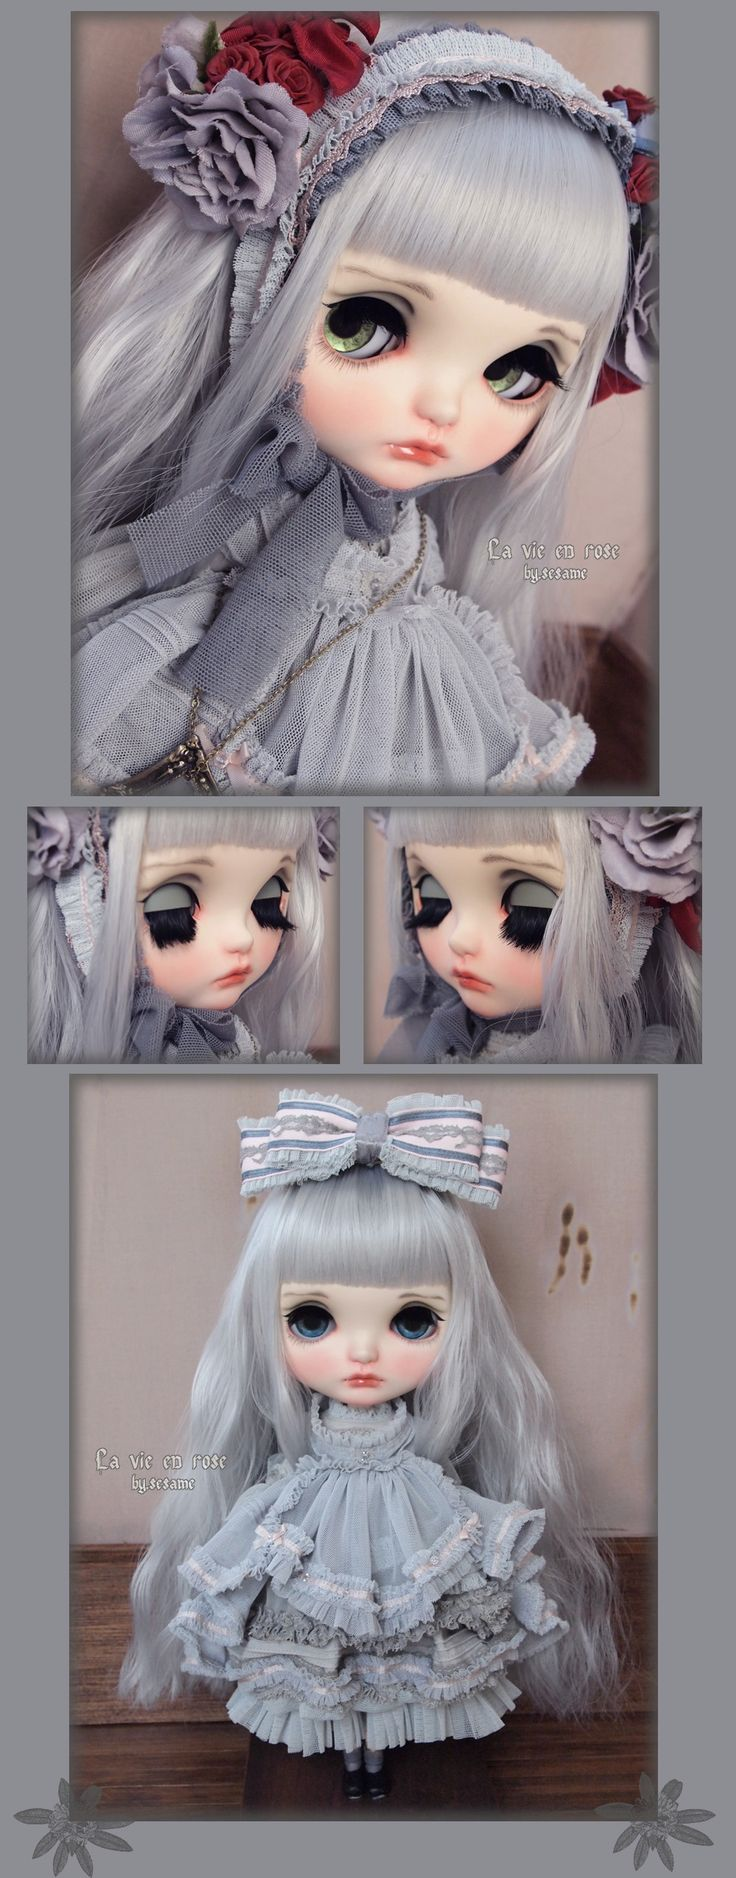 "☆ custom Bryce 'la vie en rose' ☆ ""By.Sesame"" Admin - Auction - Rinkya! Japan Auction & Shopping"